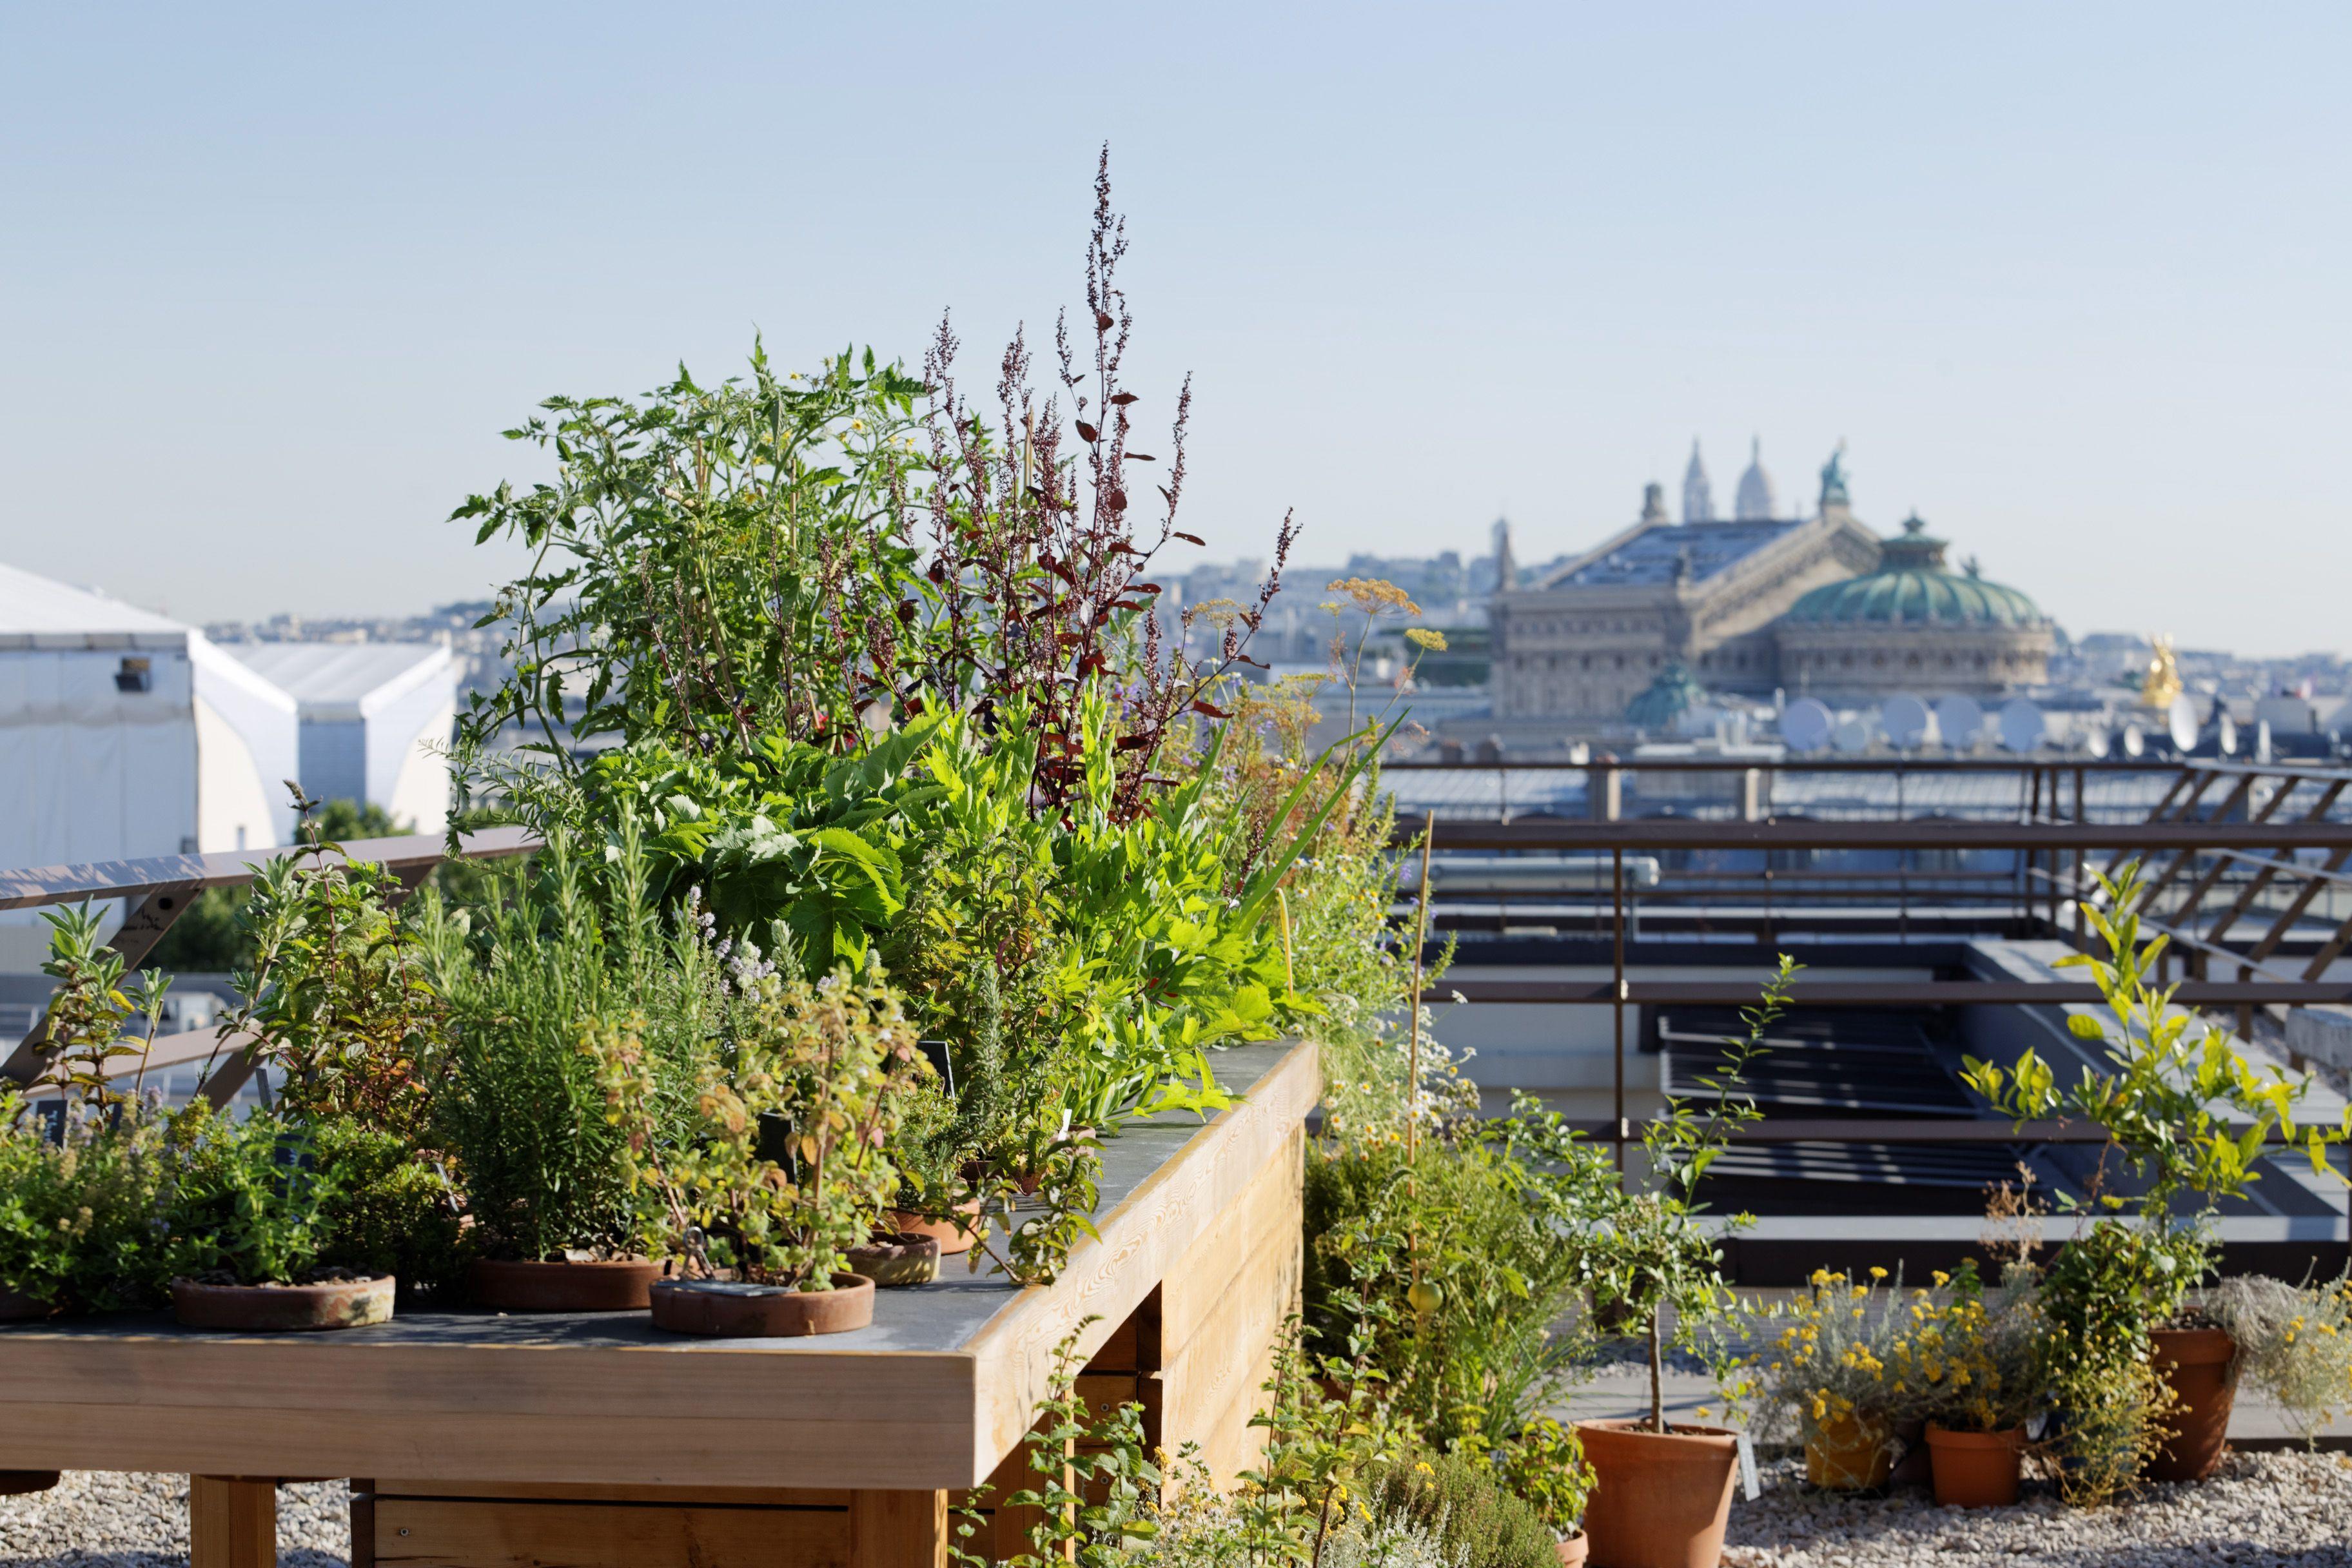 Jardins Terrasses Rooftop Hotel Mandarin Oriental Paris Concepteur Paysagiste Christophe Gautrand Palace Luxe M Fleurs Comestibles Paysagiste Jardins